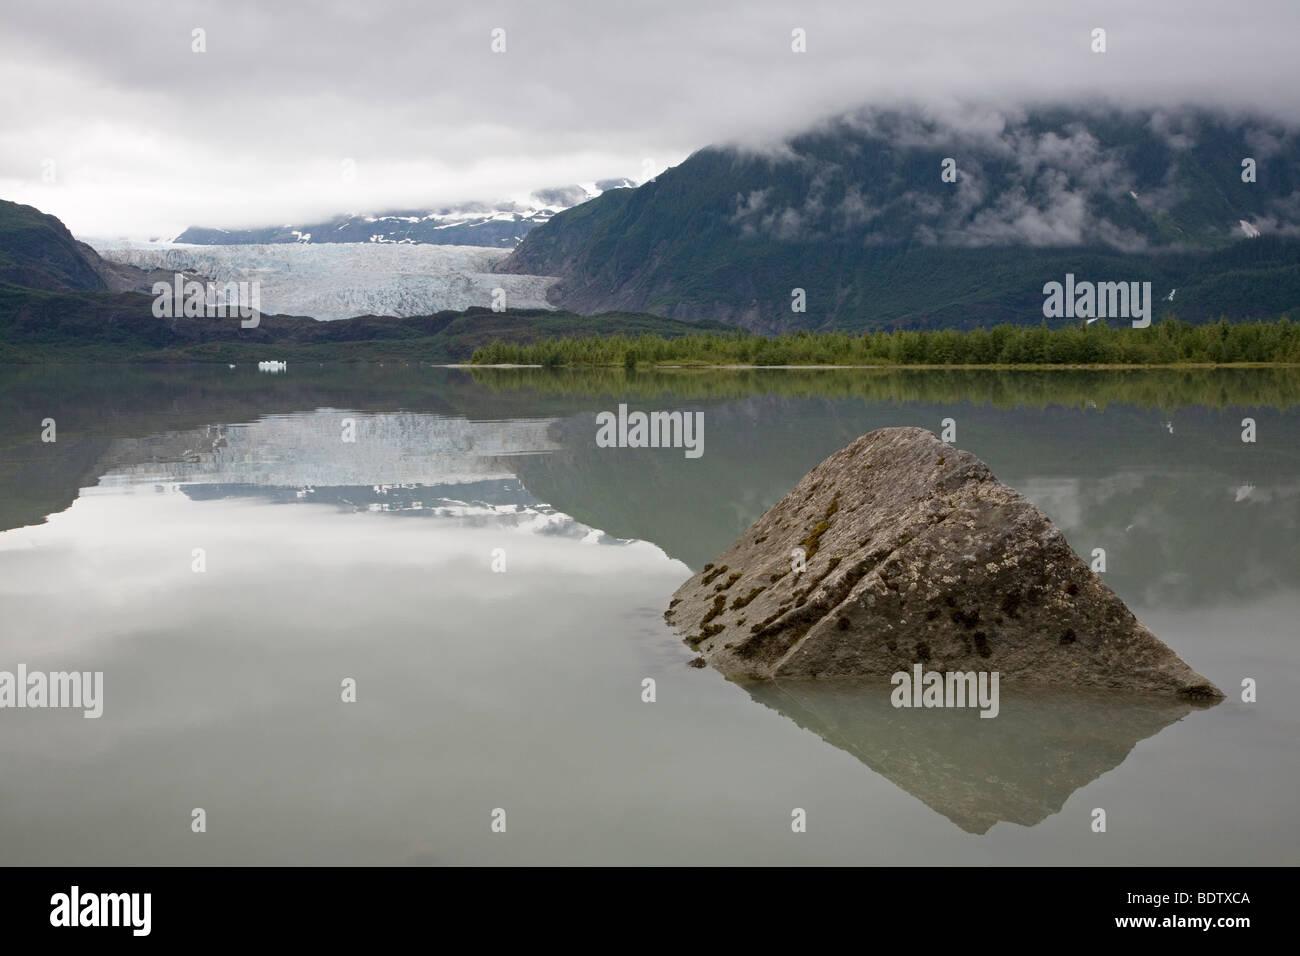 Mendenhall-Gletscher & Mendenhall-See / Mendenhall-Glacier & Mendenhall-Lake / Juneau - Alaska - Stock Image